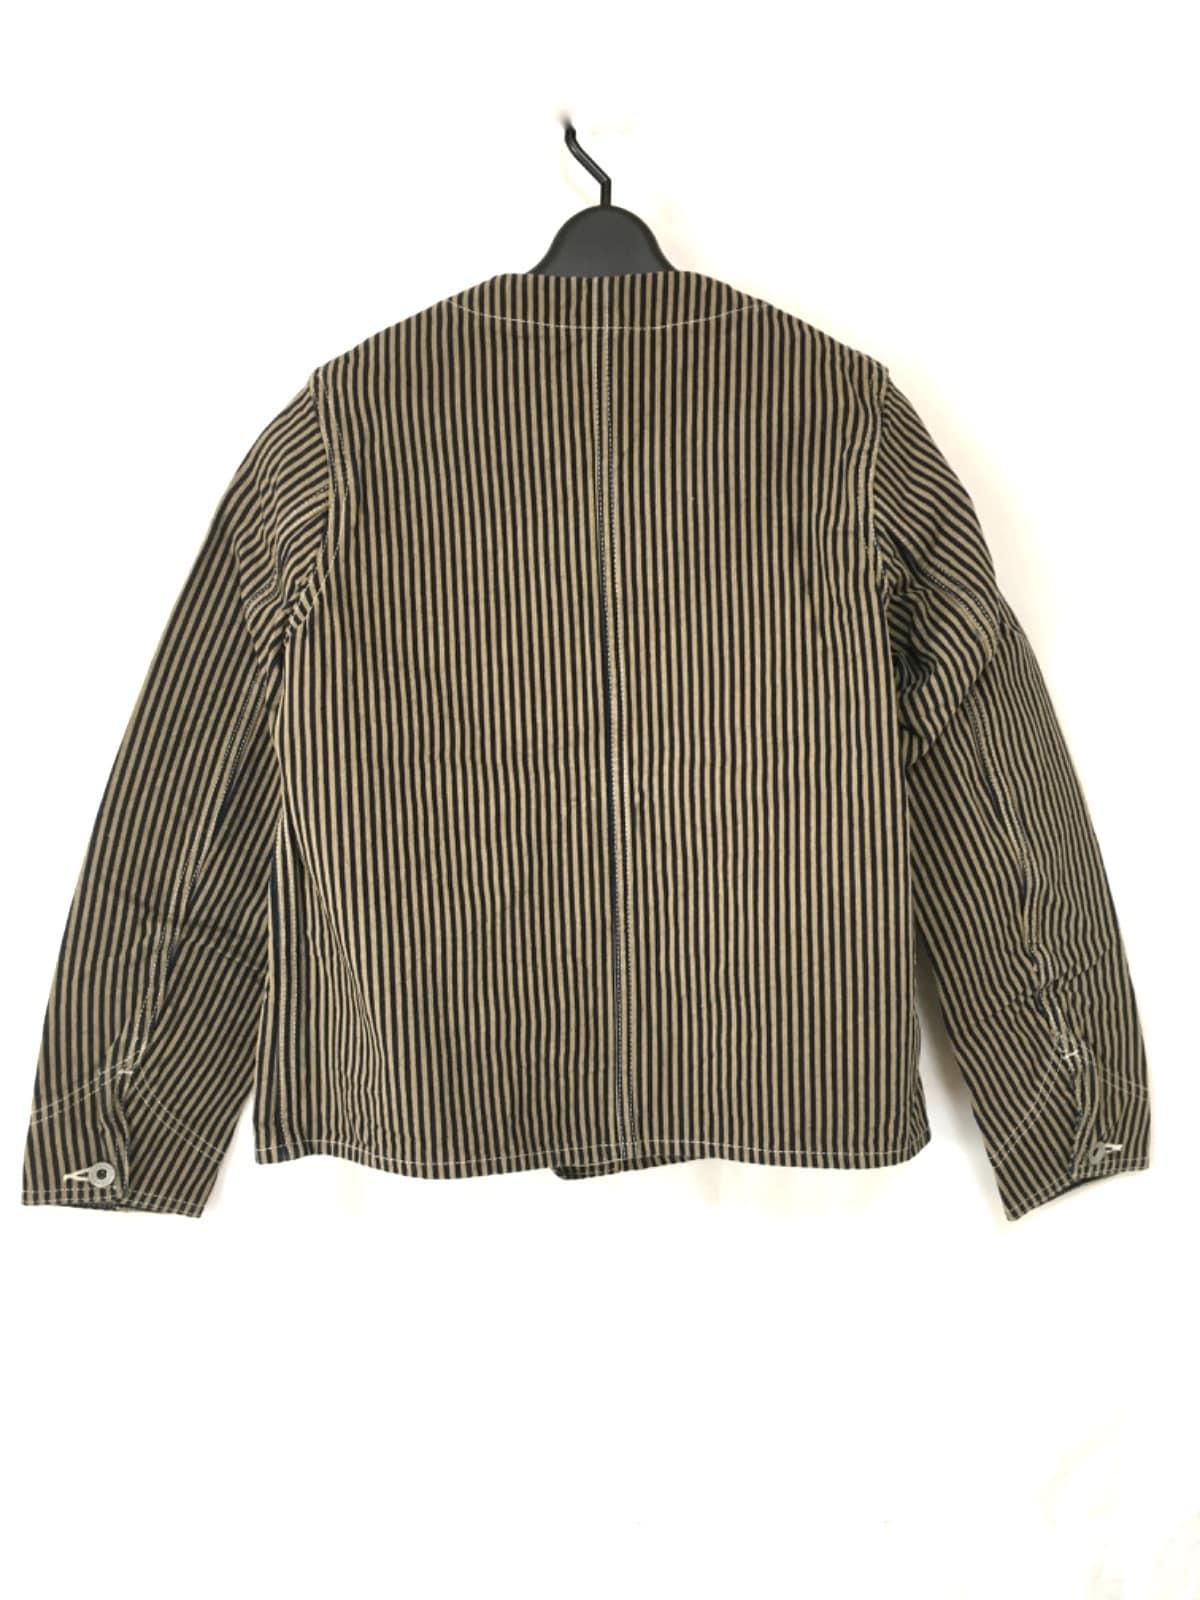 HEAD LIGHT(ヘッドライト)のジャケット